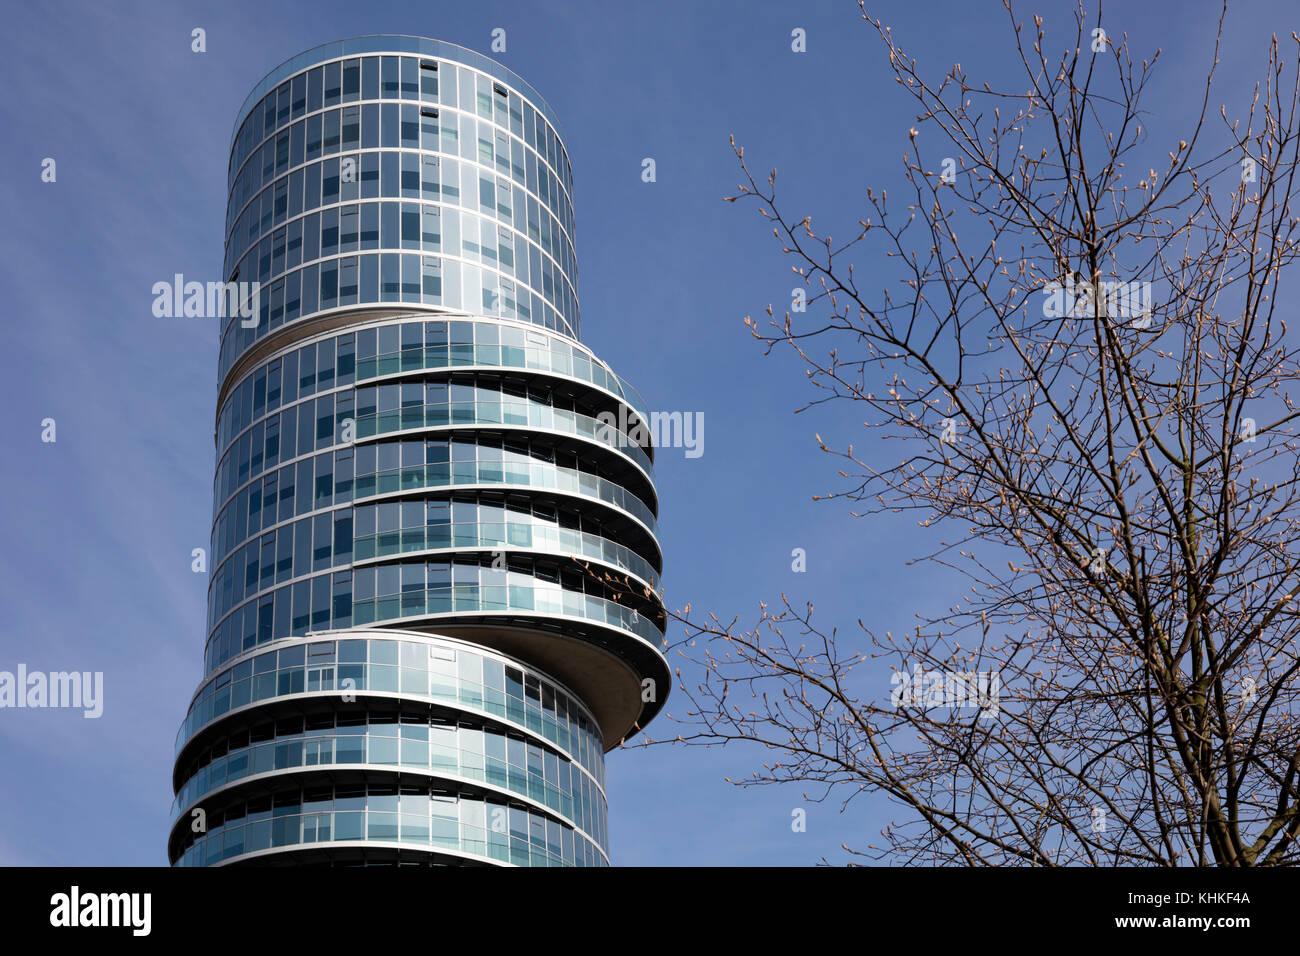 Exzenterhaus, Bochum, Ruhr area, North Rhine-Westphalia, Germany, Europe - Stock Image